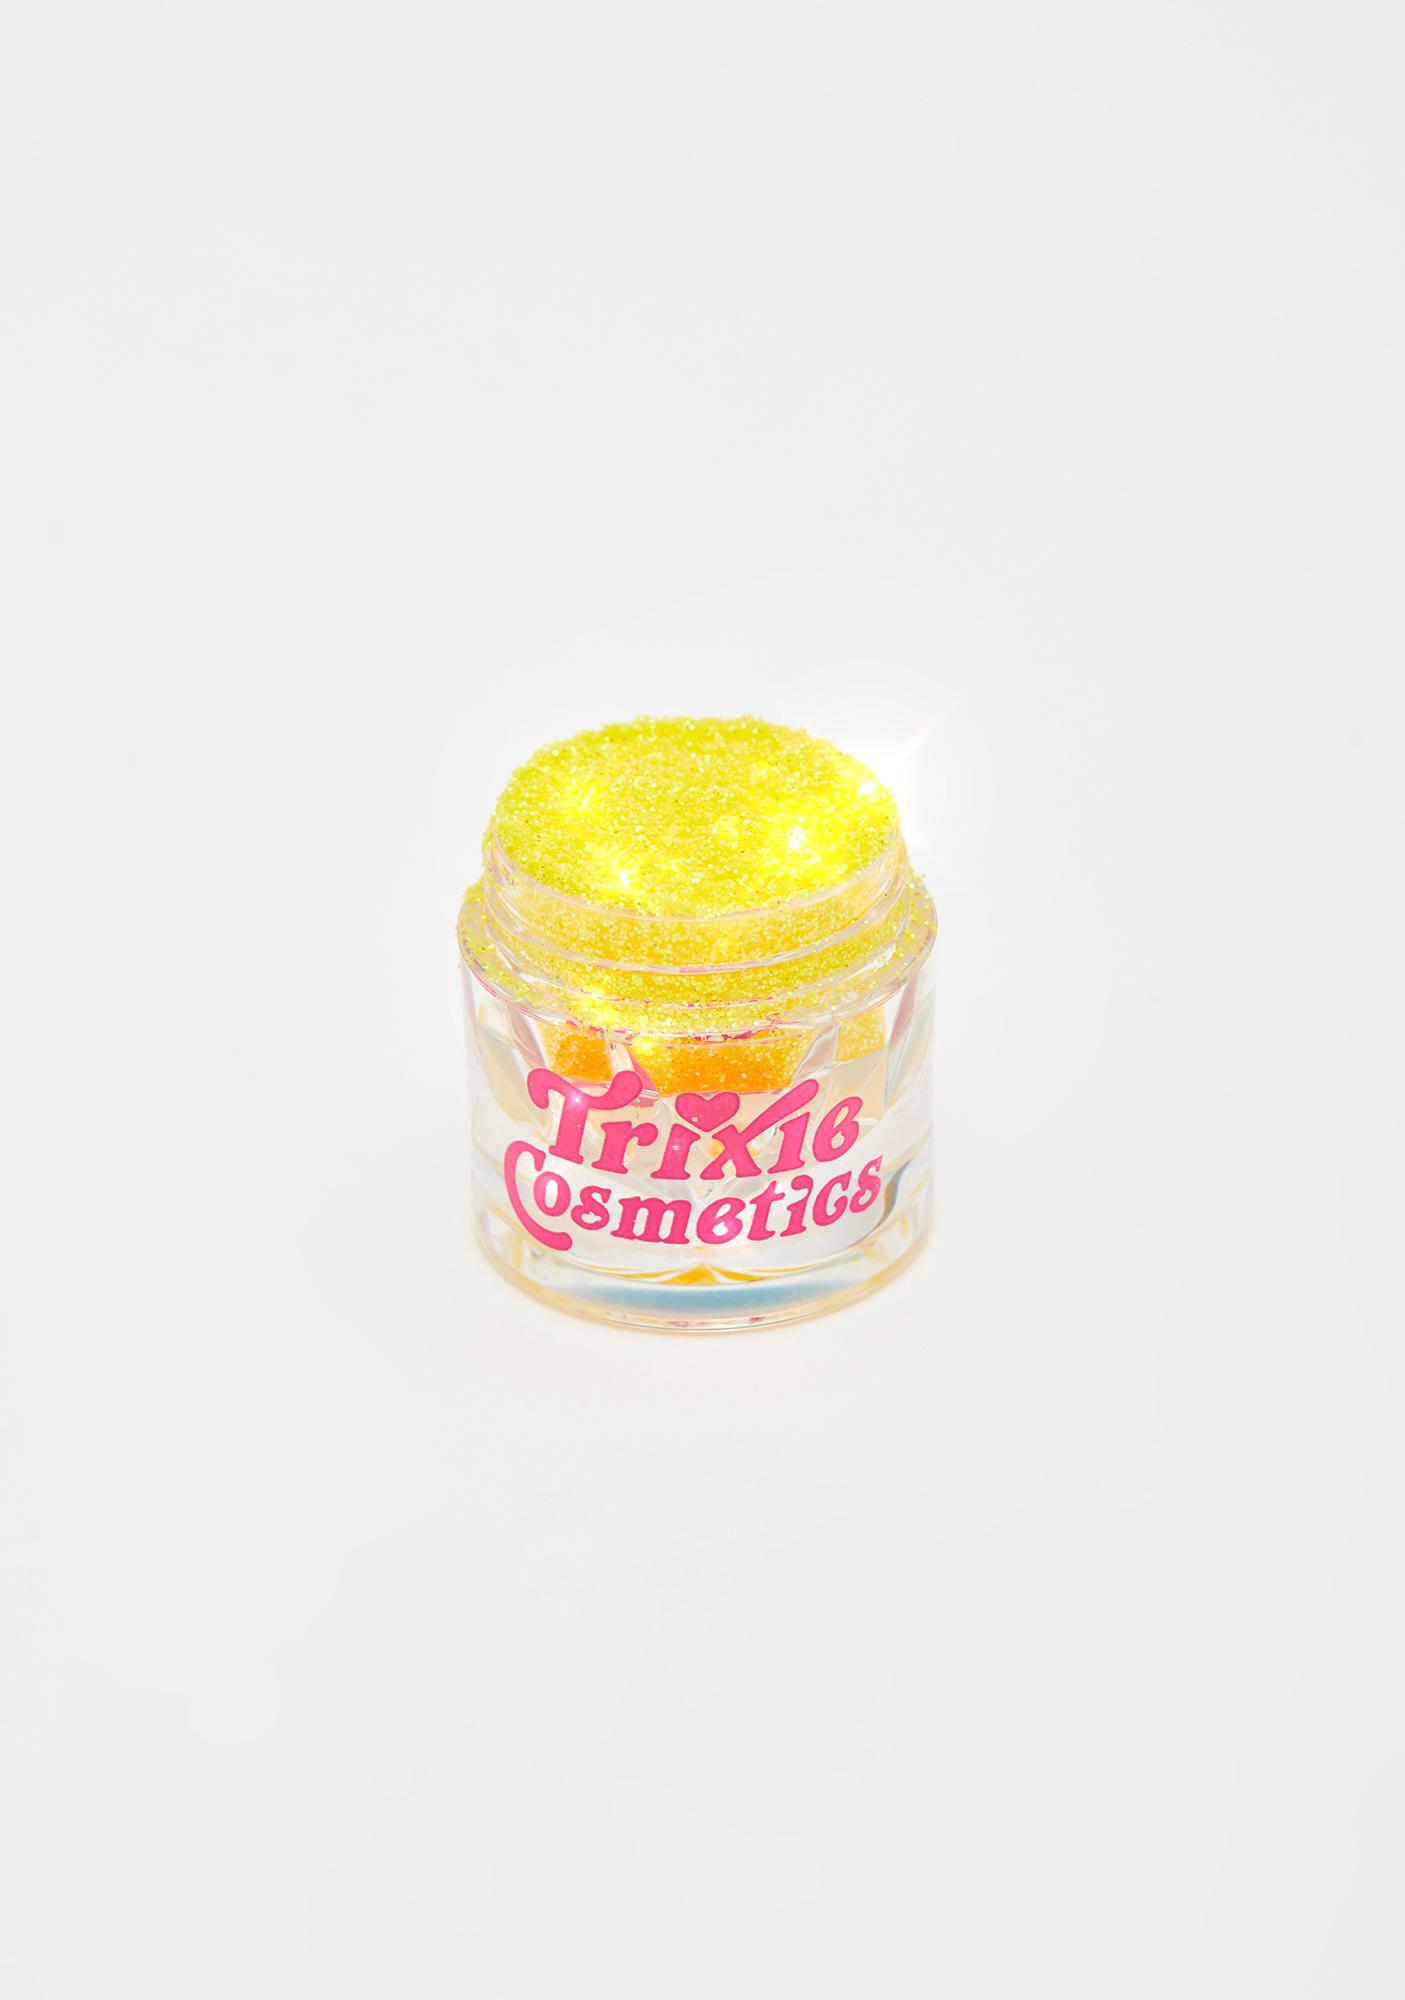 Trixie Cosmetics Lemon Bar Sparkles Loose Glitter